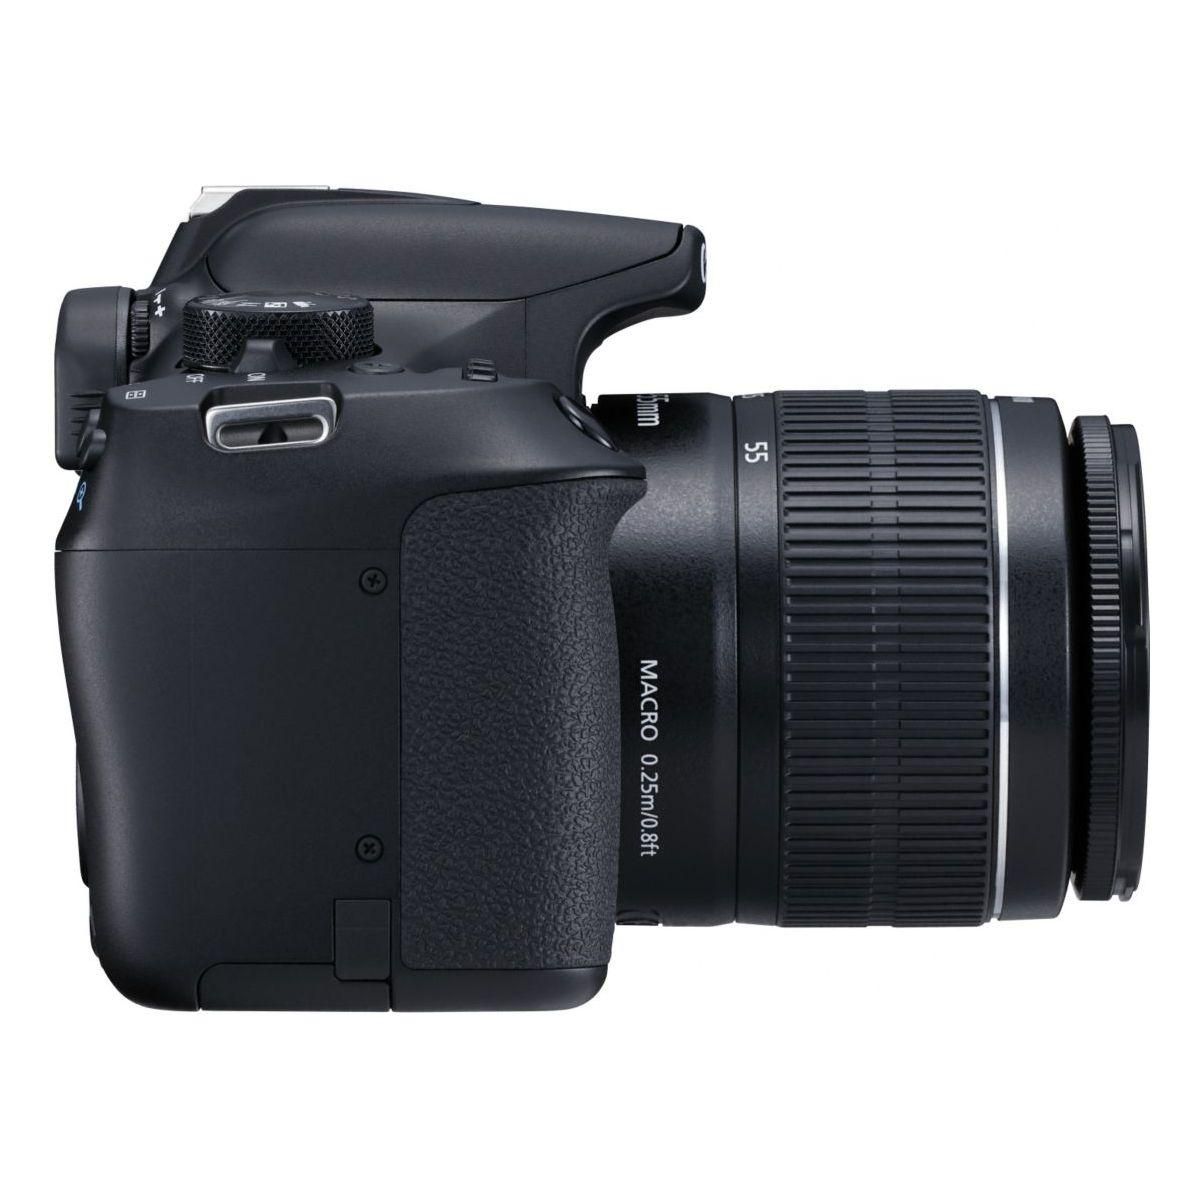 Reflex - Canon EOS 1300D - Negro + Lente Canon 18-55 mm + 55-250 mm